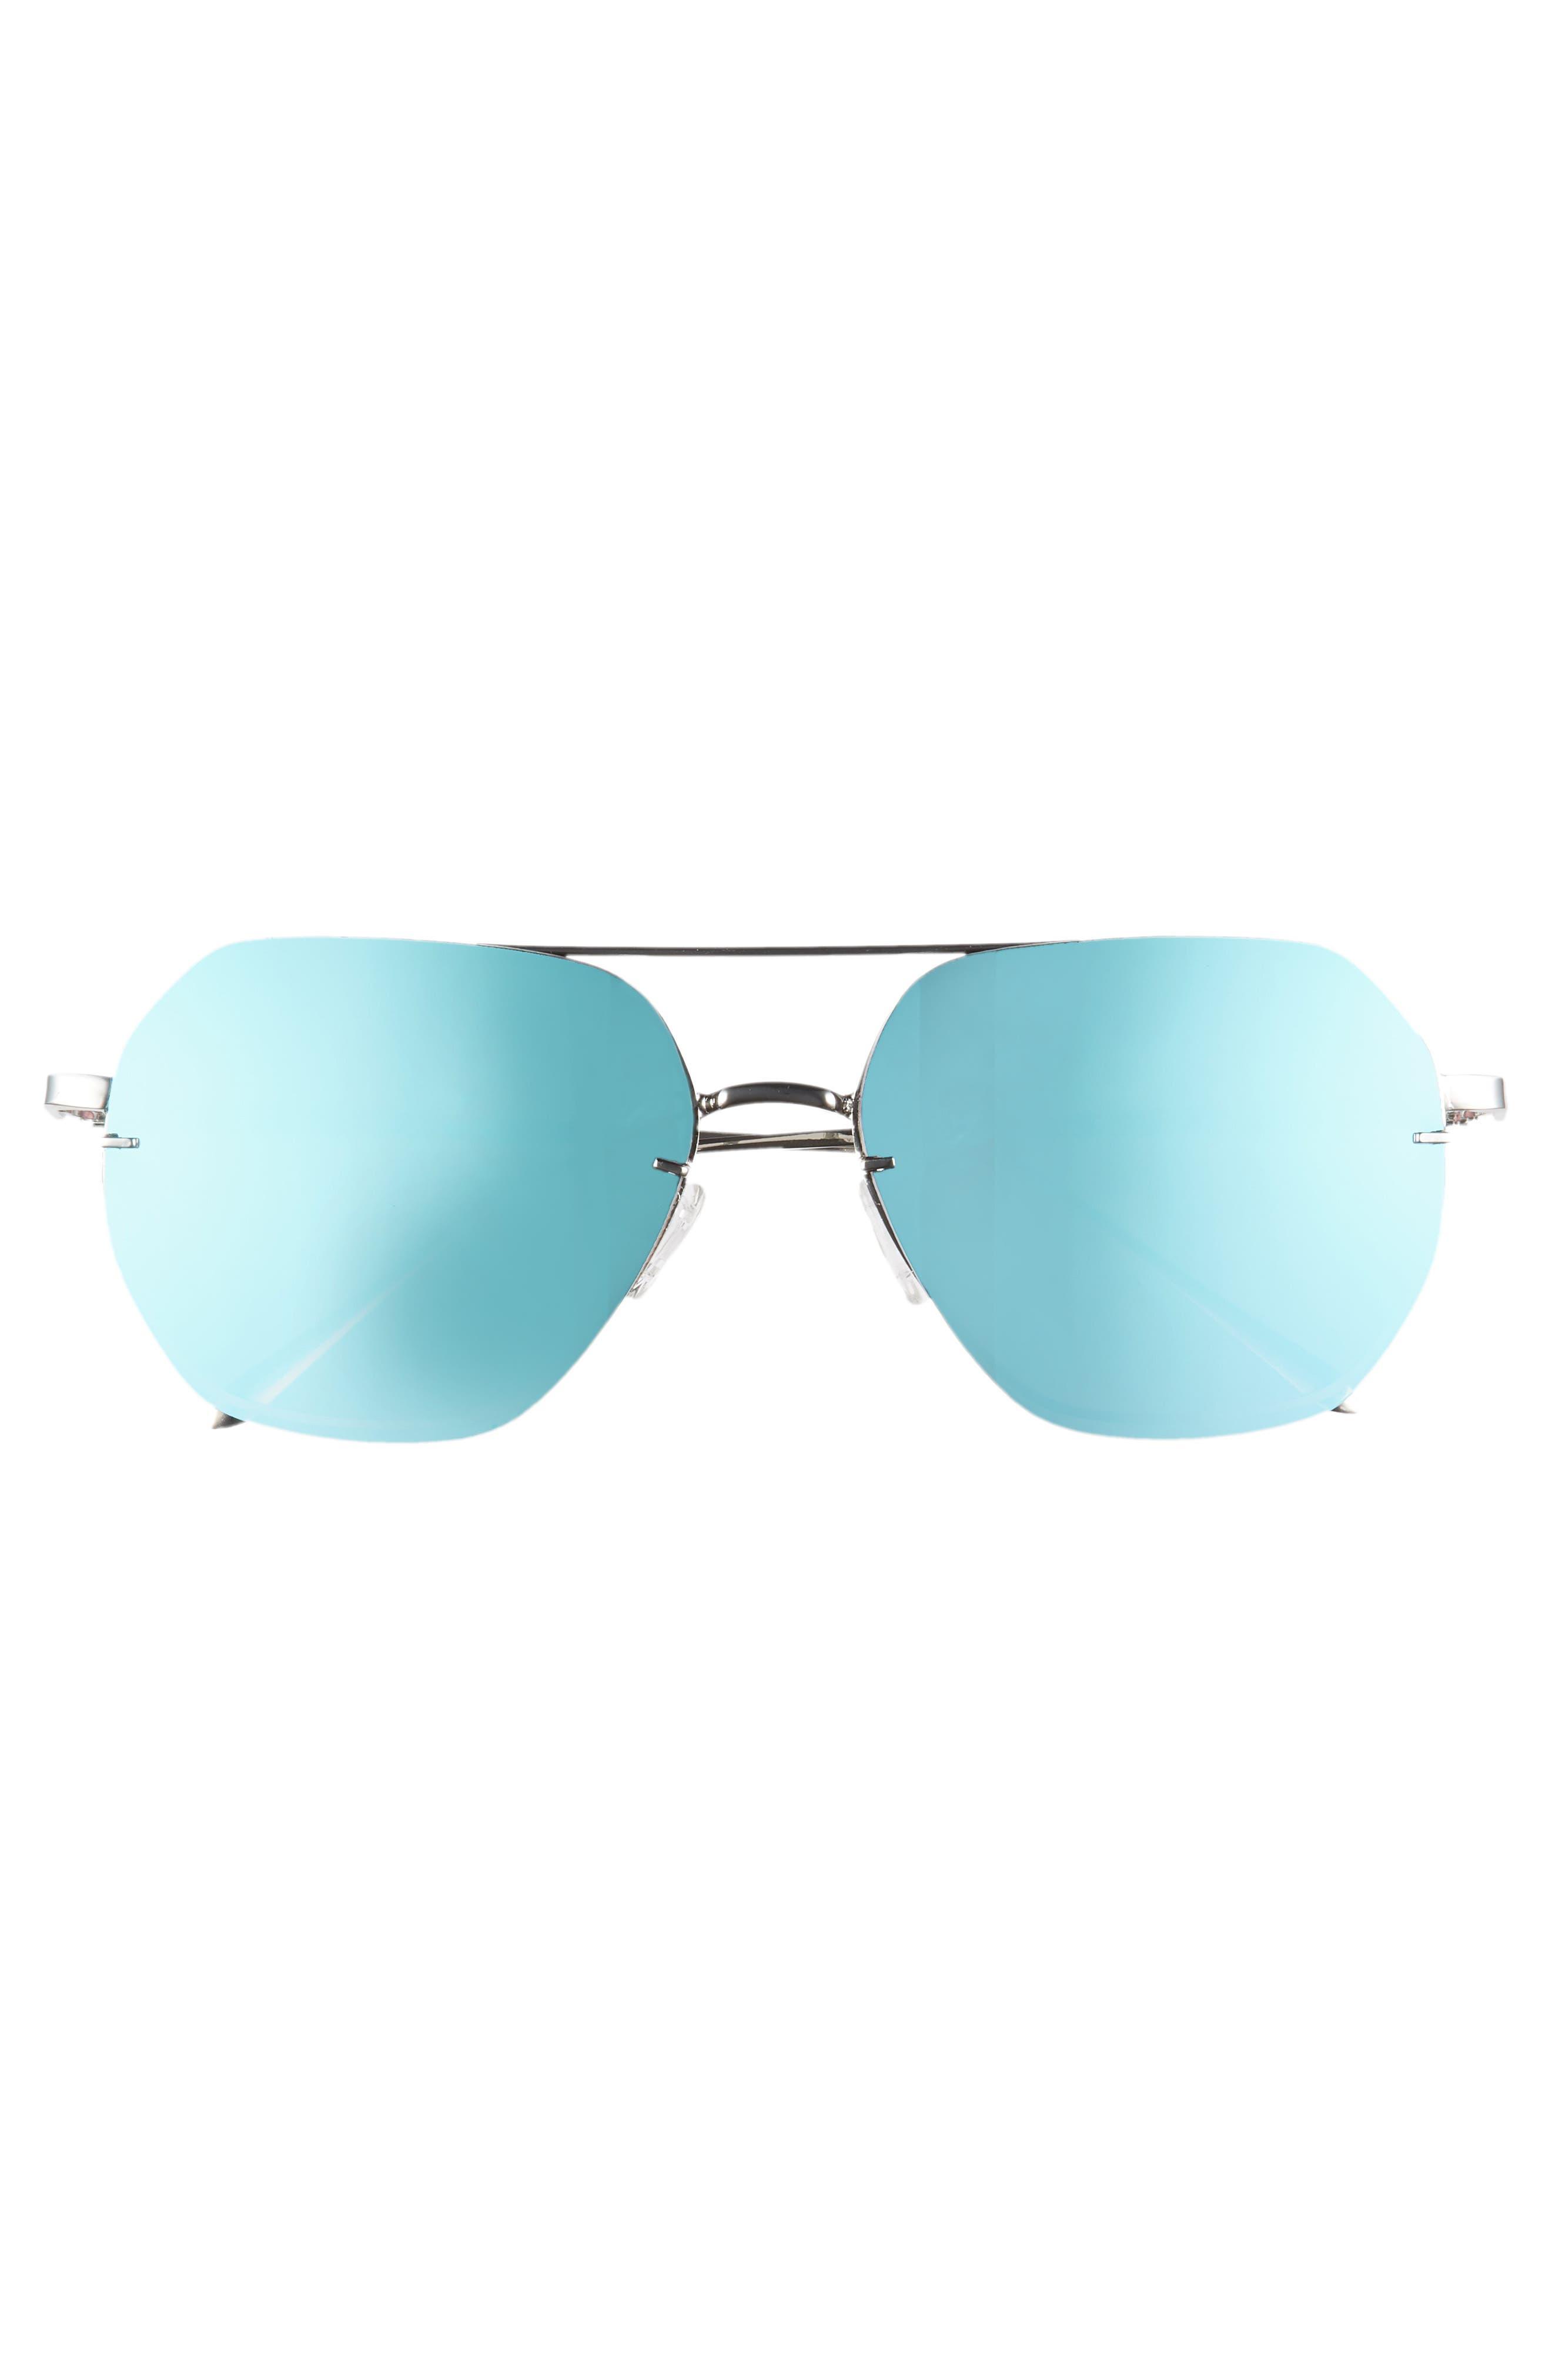 62mm Metal Flat Geo Aviator Sunglasses,                             Alternate thumbnail 3, color,                             Silver/ Blue